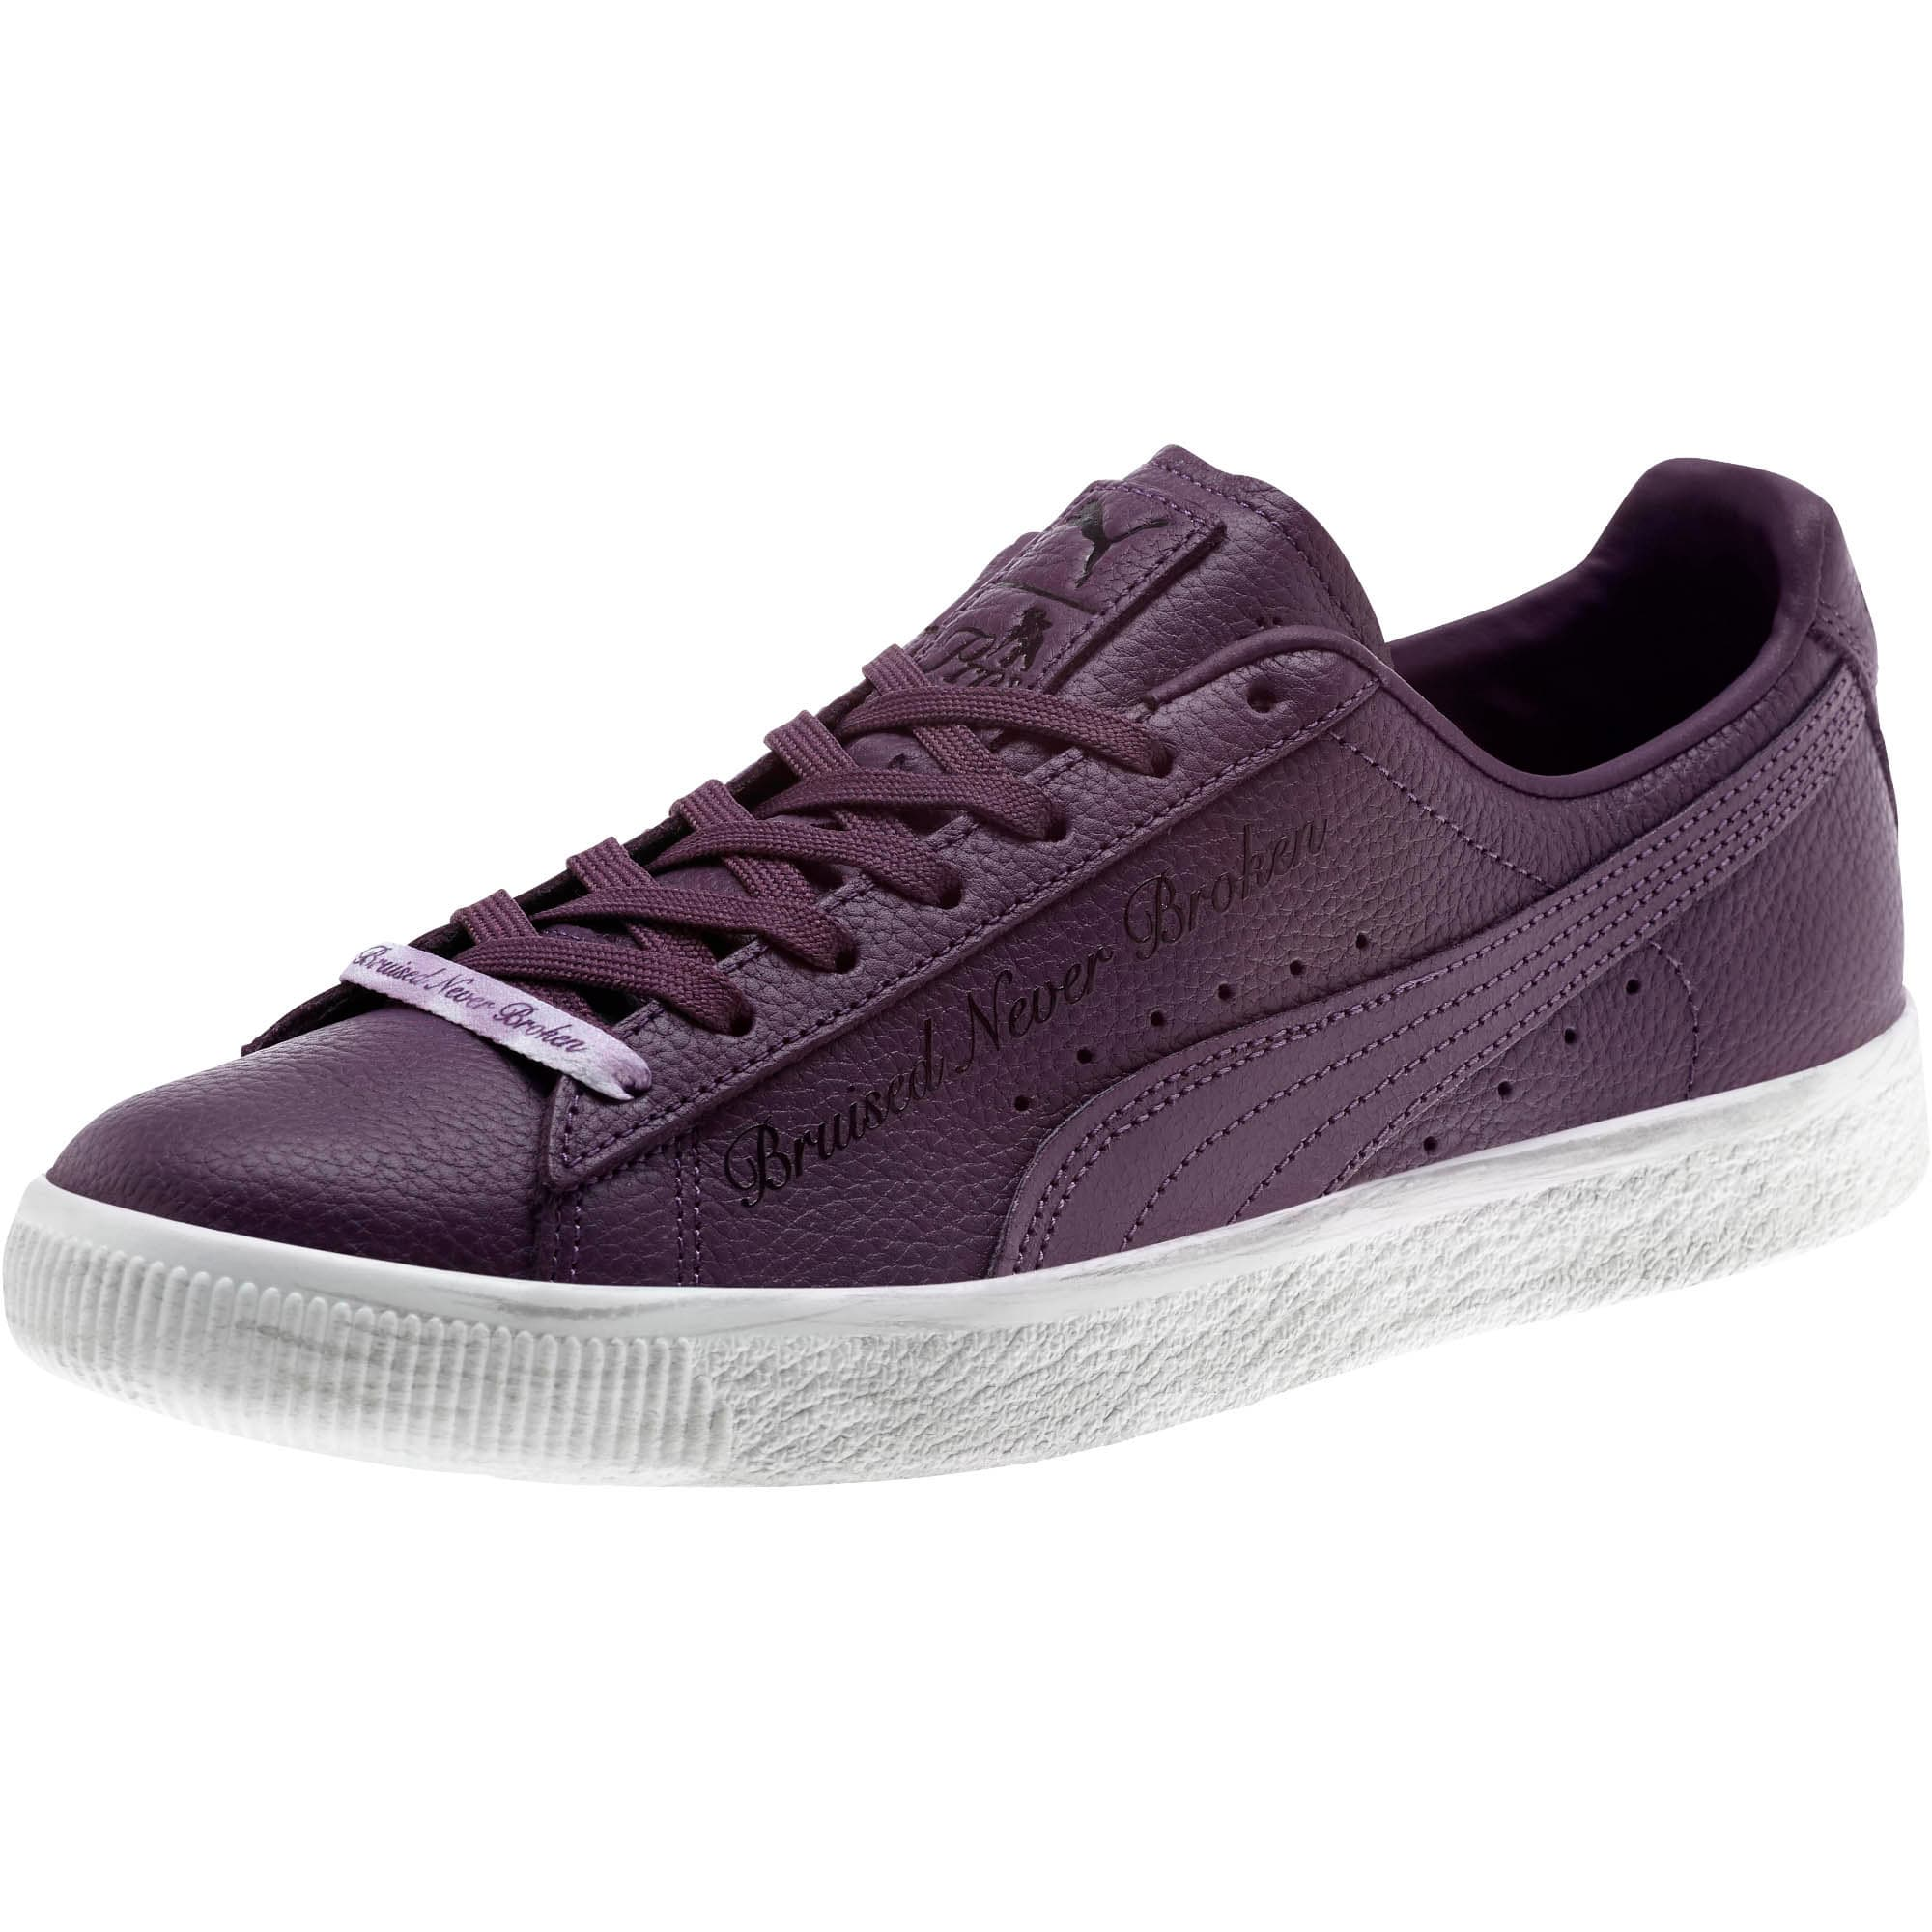 Thumbnail 1 of Clyde x PRPS Sneakers, Indigo-Puma Black, medium